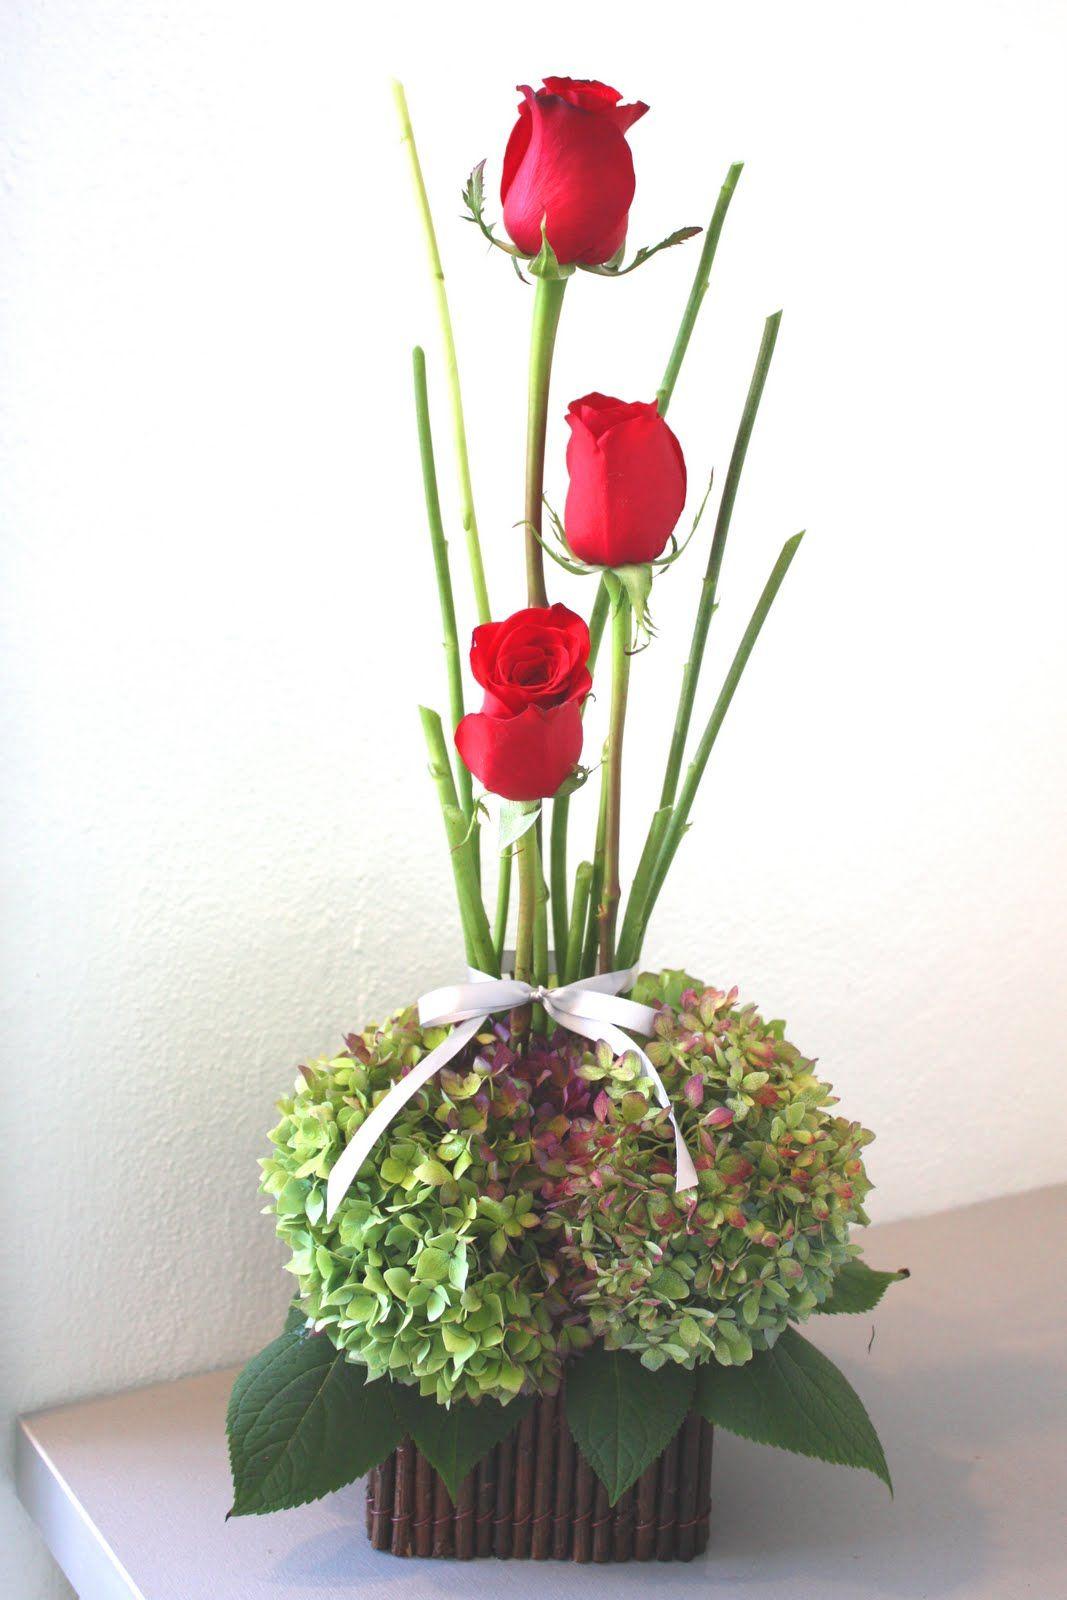 Red Roses Green Hydrangeas Green Hydrangea Flower Gift Flower